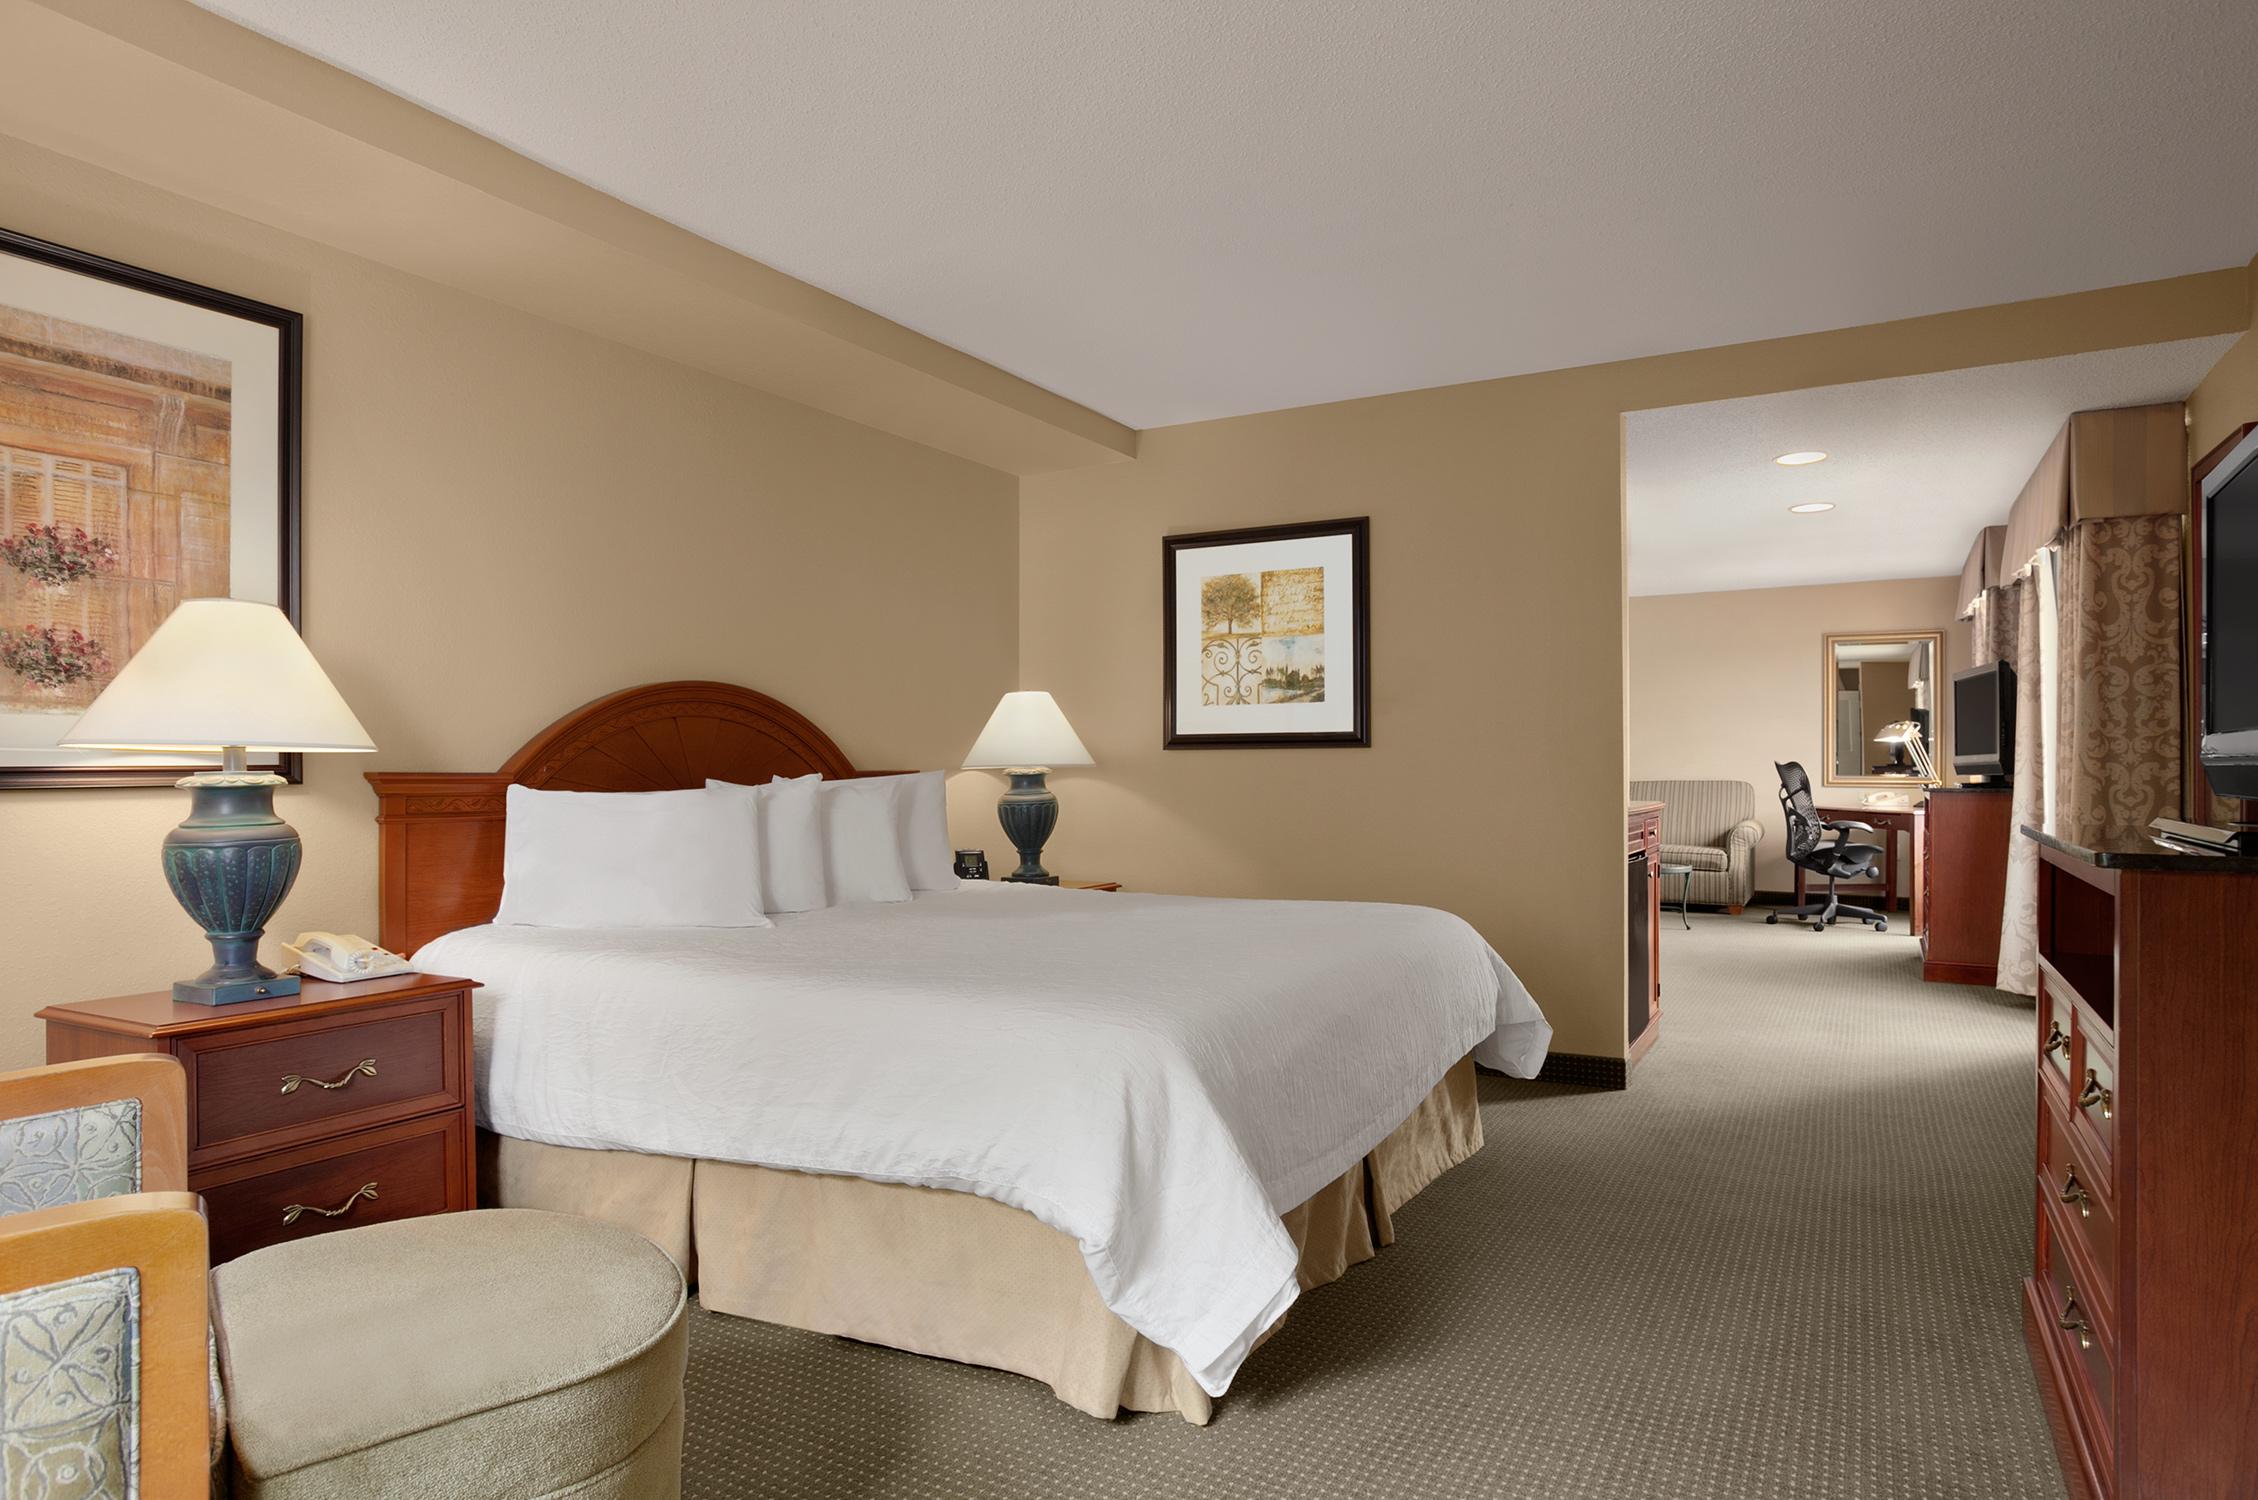 Hilton Garden Inn Saratoga Springs Coupons Saratoga Springs Ny Near Me 8coupons